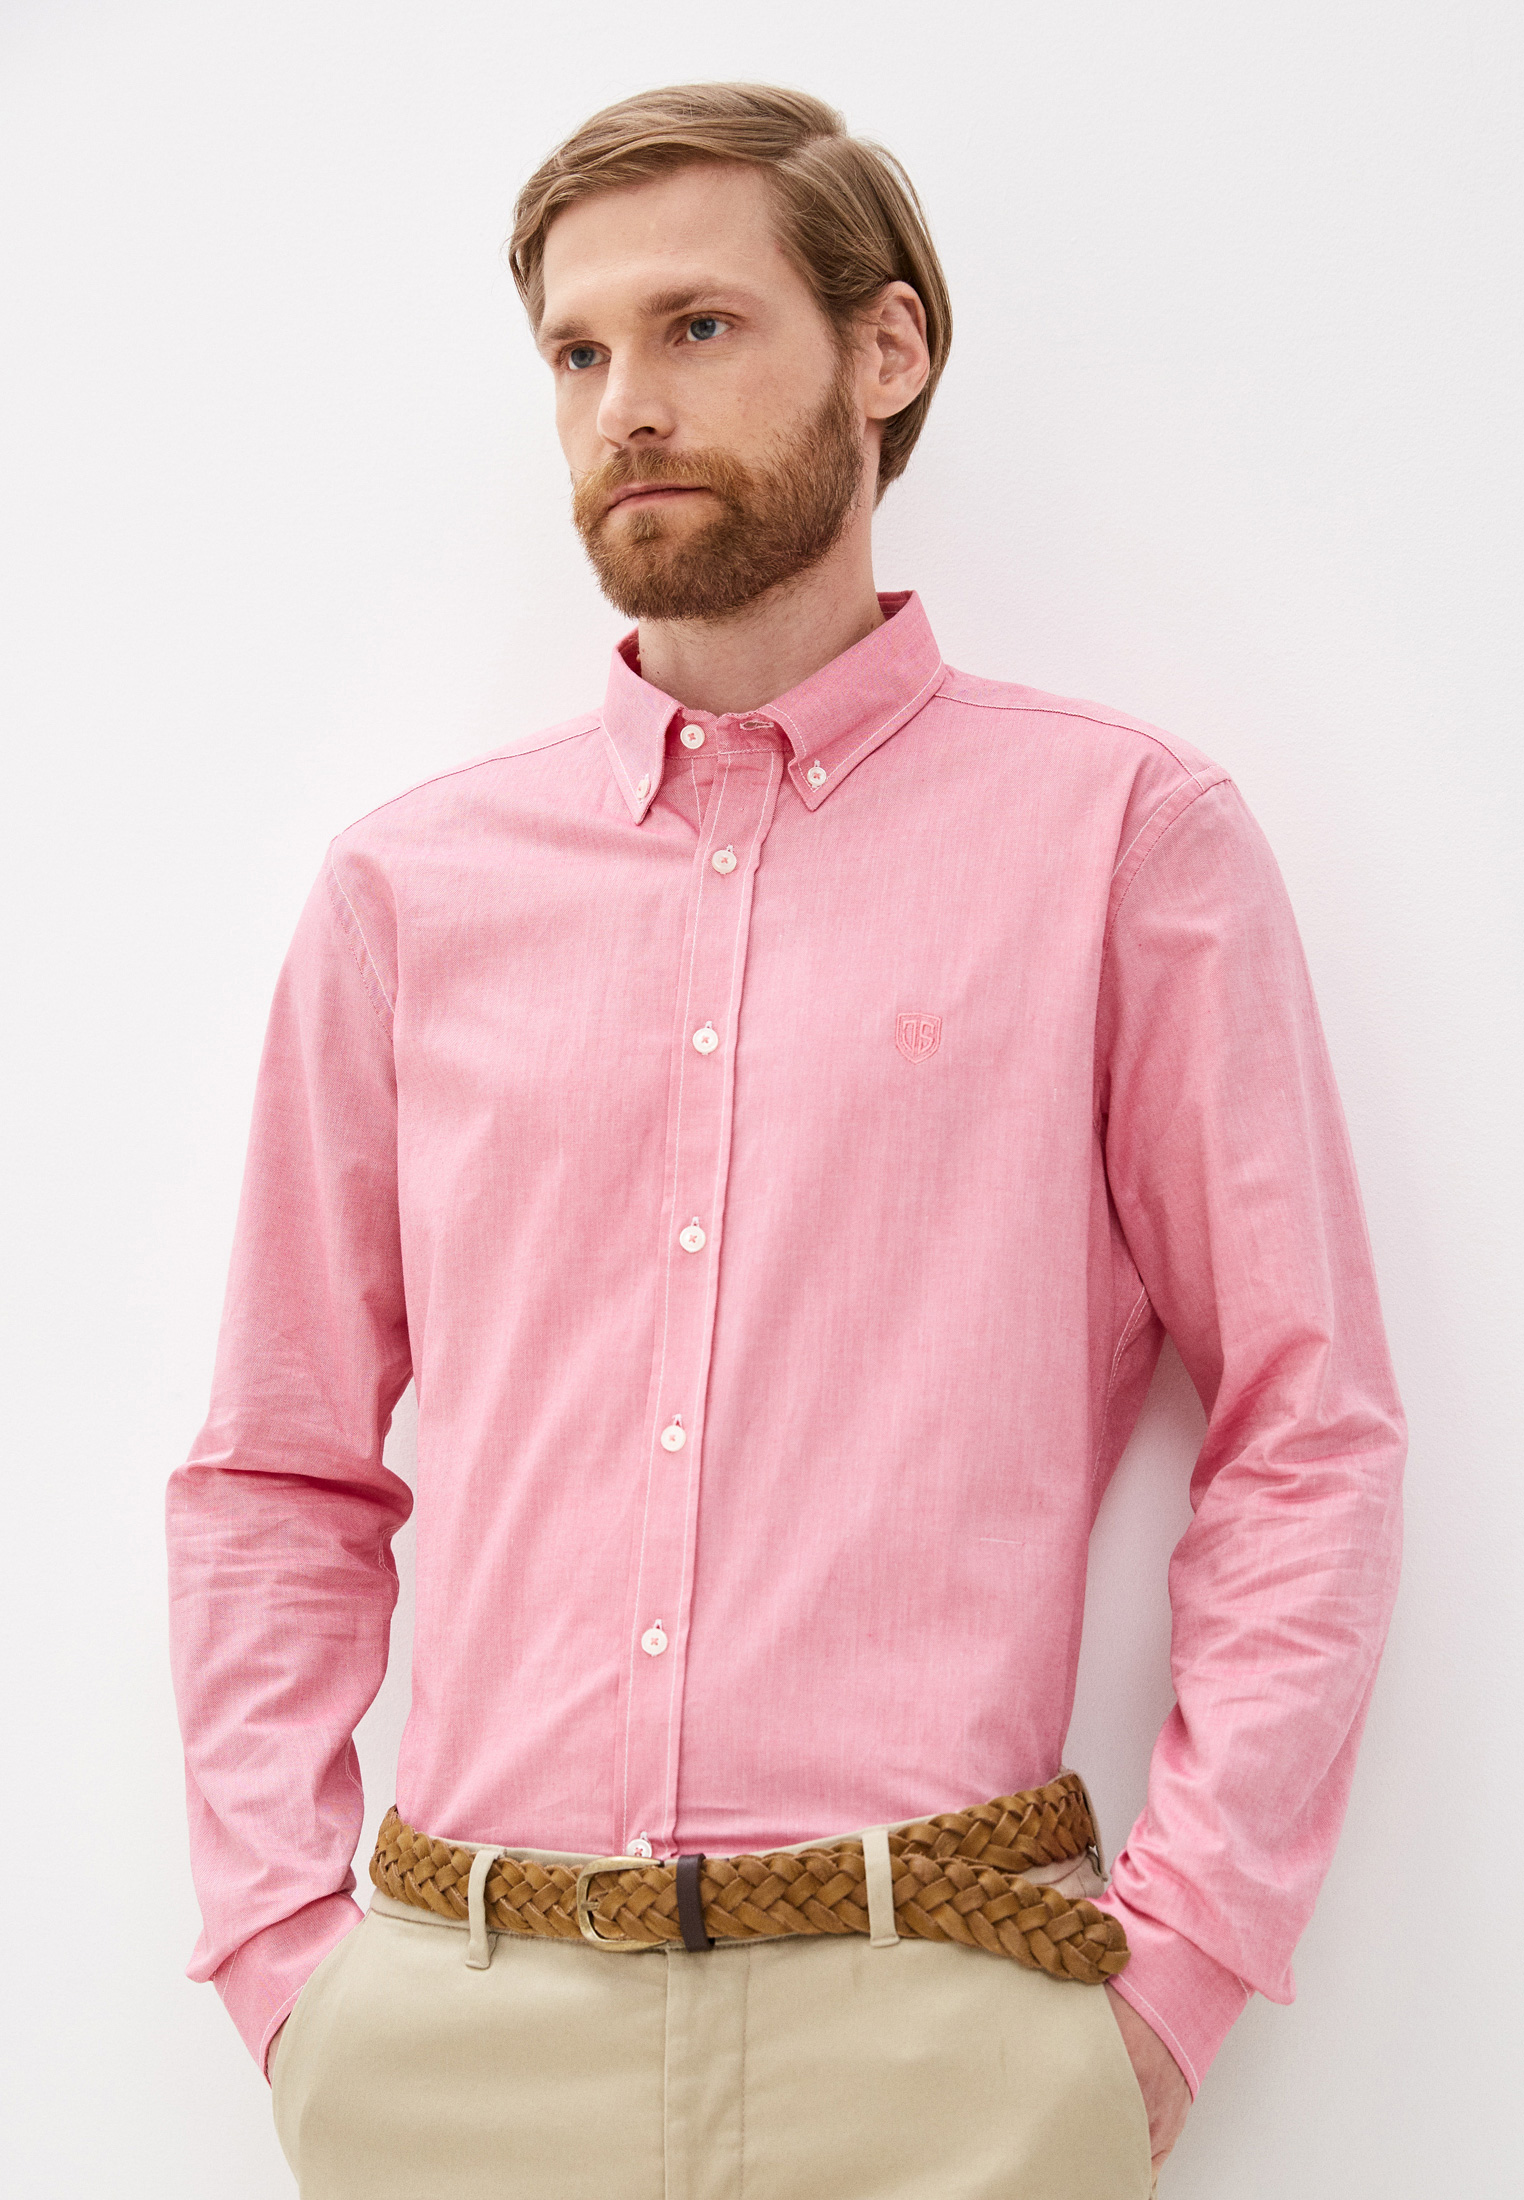 Рубашка с длинным рукавом JIMMY SANDERS (Джимми Сандерс) Рубашка Jimmy Sanders